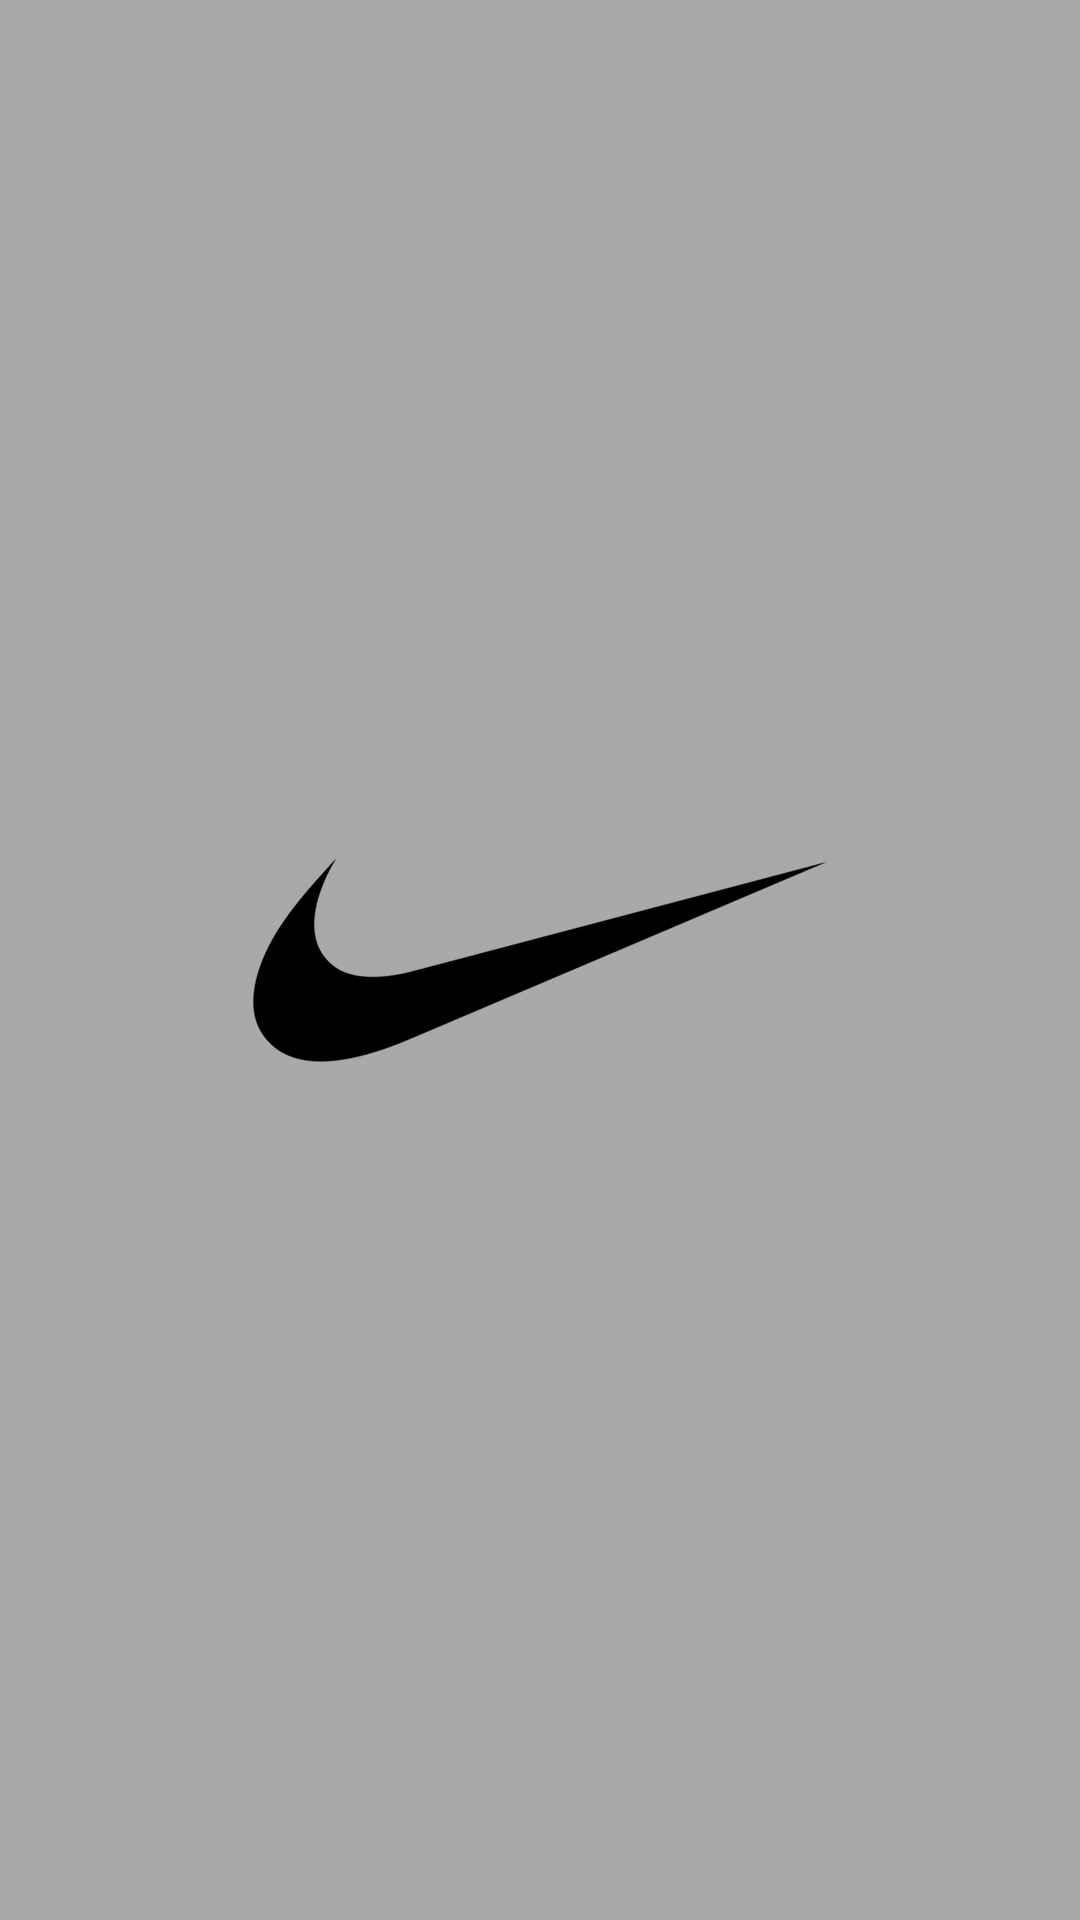 Res: 1080x1920, Iphone 5s Wallpaper, Screen Wallpaper, Wallpaper Backgrounds, Iphone  Wallpapers, Dope Wallpapers, Nike Logo, Nike Drawings, Eminem, Papo